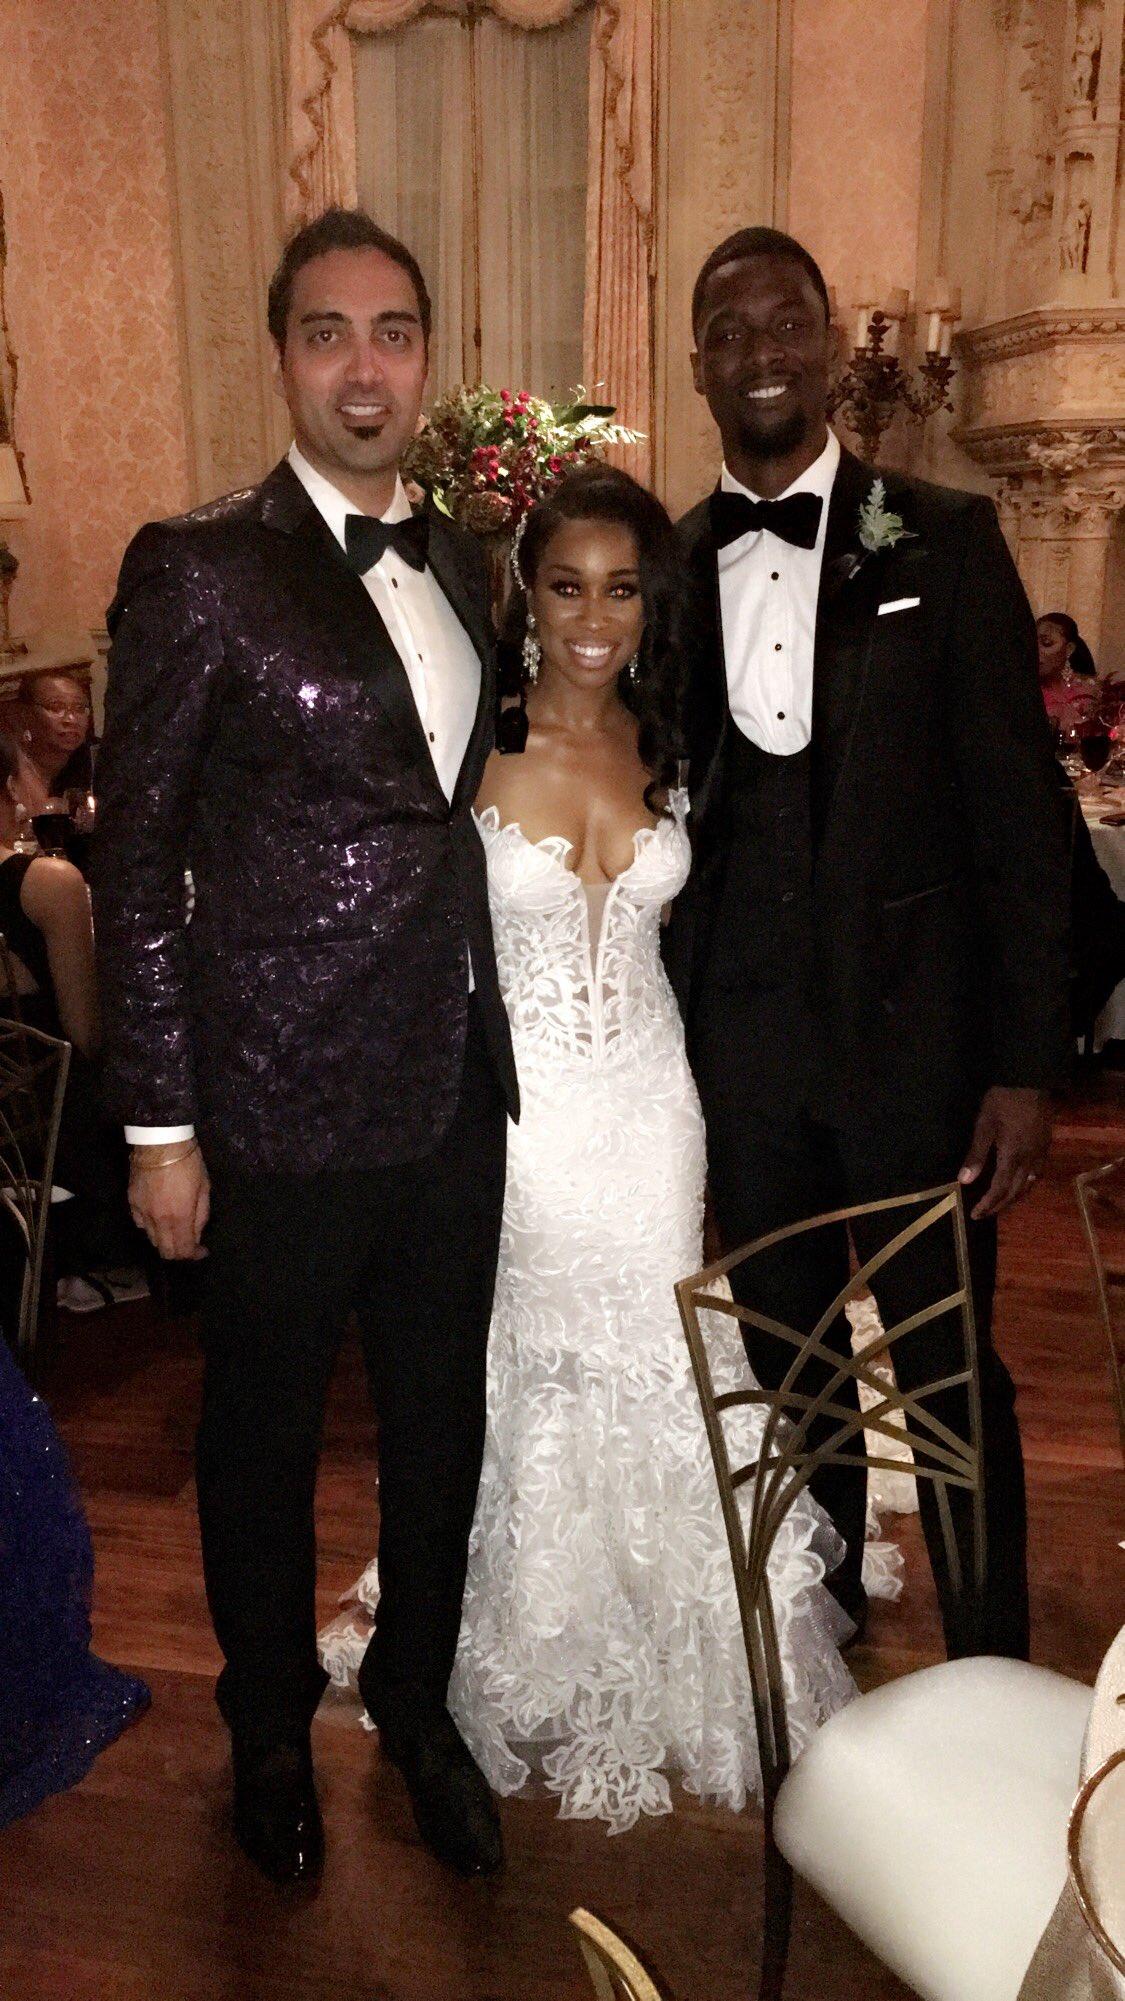 dallas mavericks star harrison barnes gets married curry